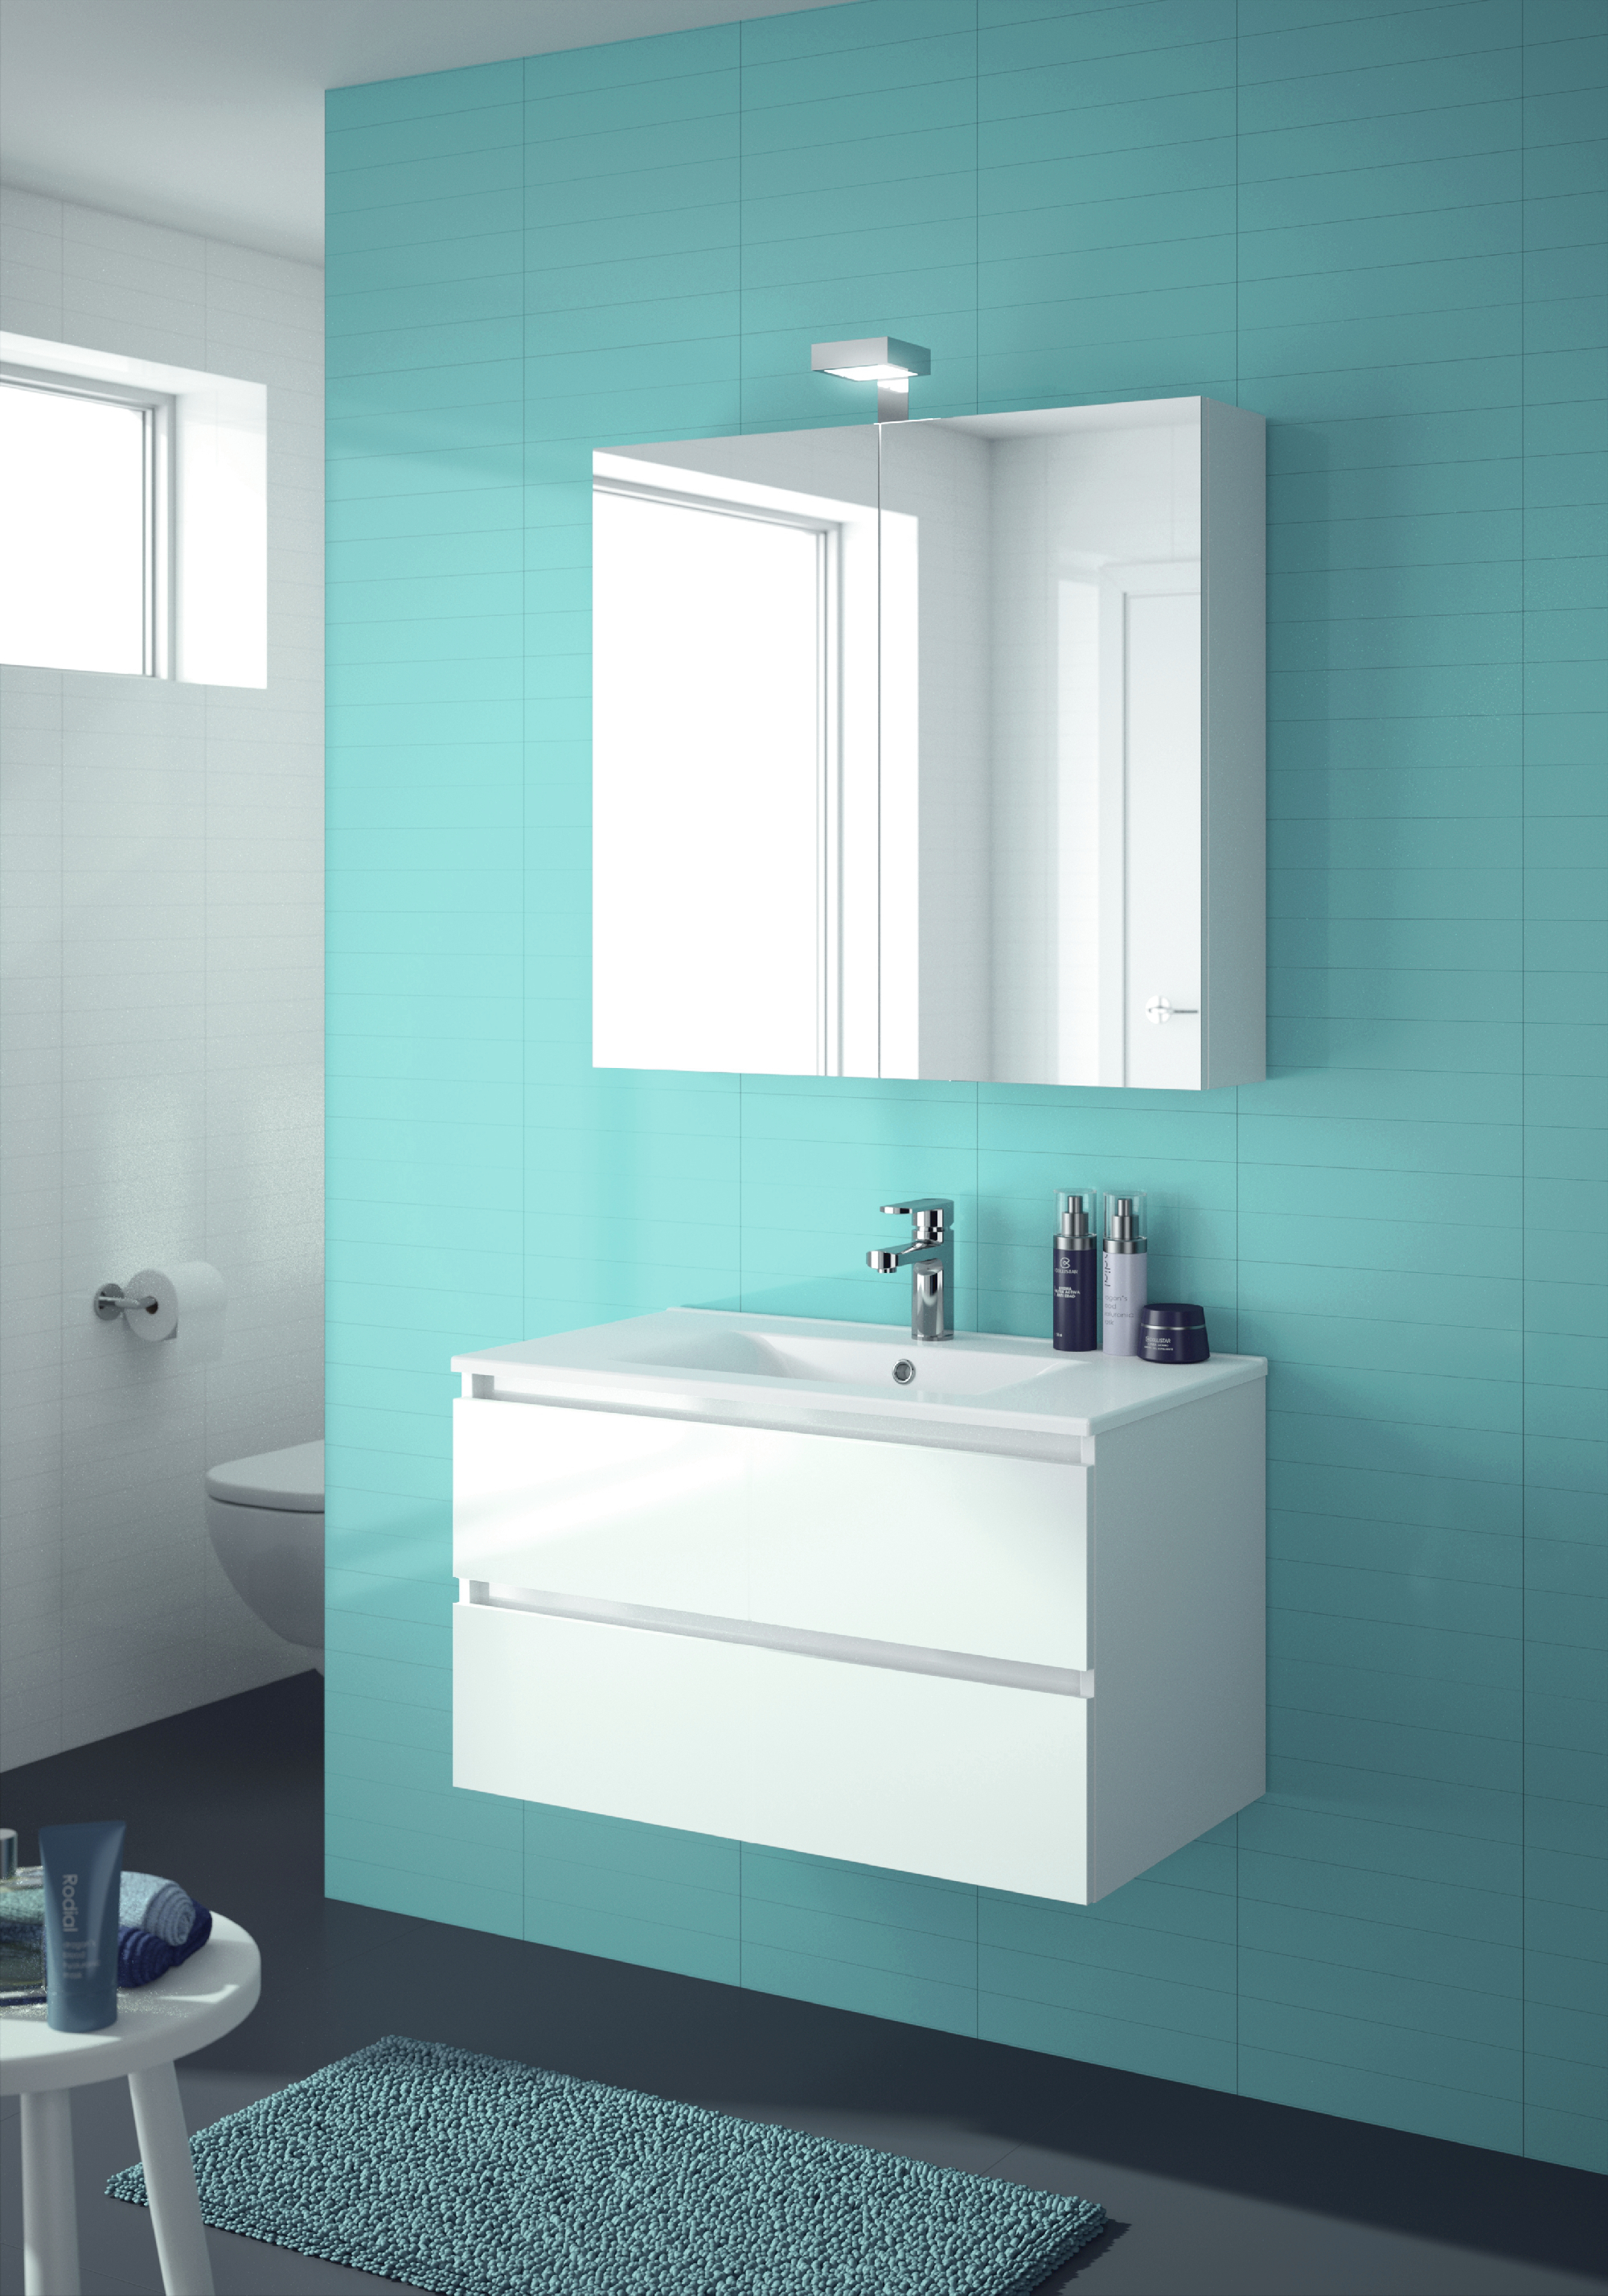 allibert badm bel badm belset vormontiert wei spiegelschrank waschtisch 80 cm 4260458244616 ebay. Black Bedroom Furniture Sets. Home Design Ideas